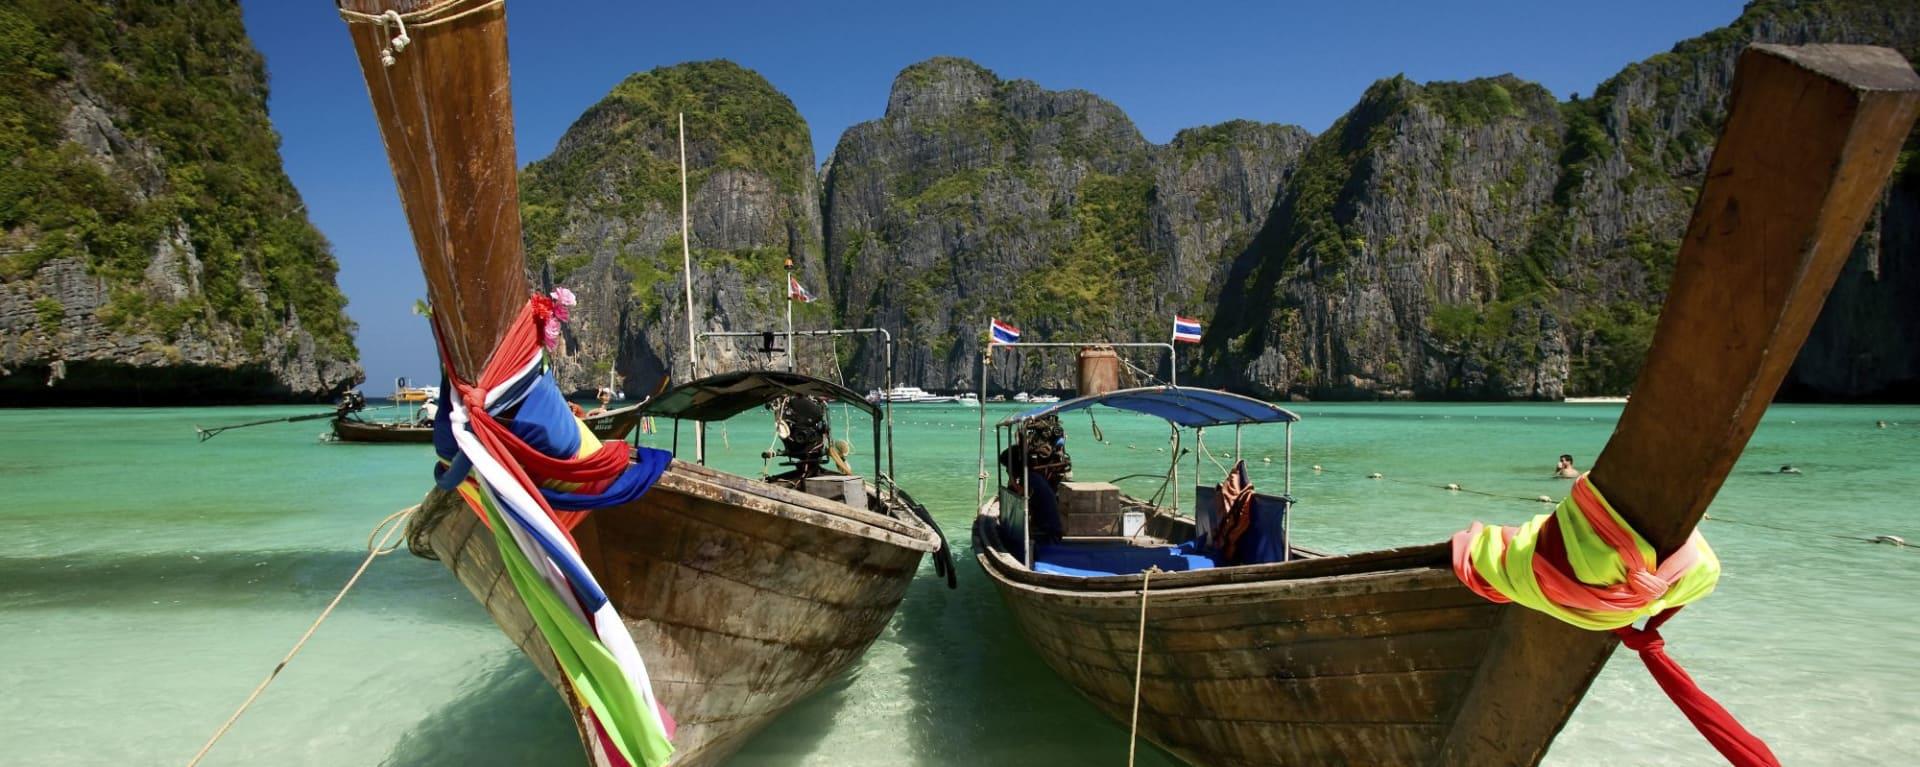 Voyages en Thaïlande | Vacances en Asie par tourasia: Phi Phi Maya Bay